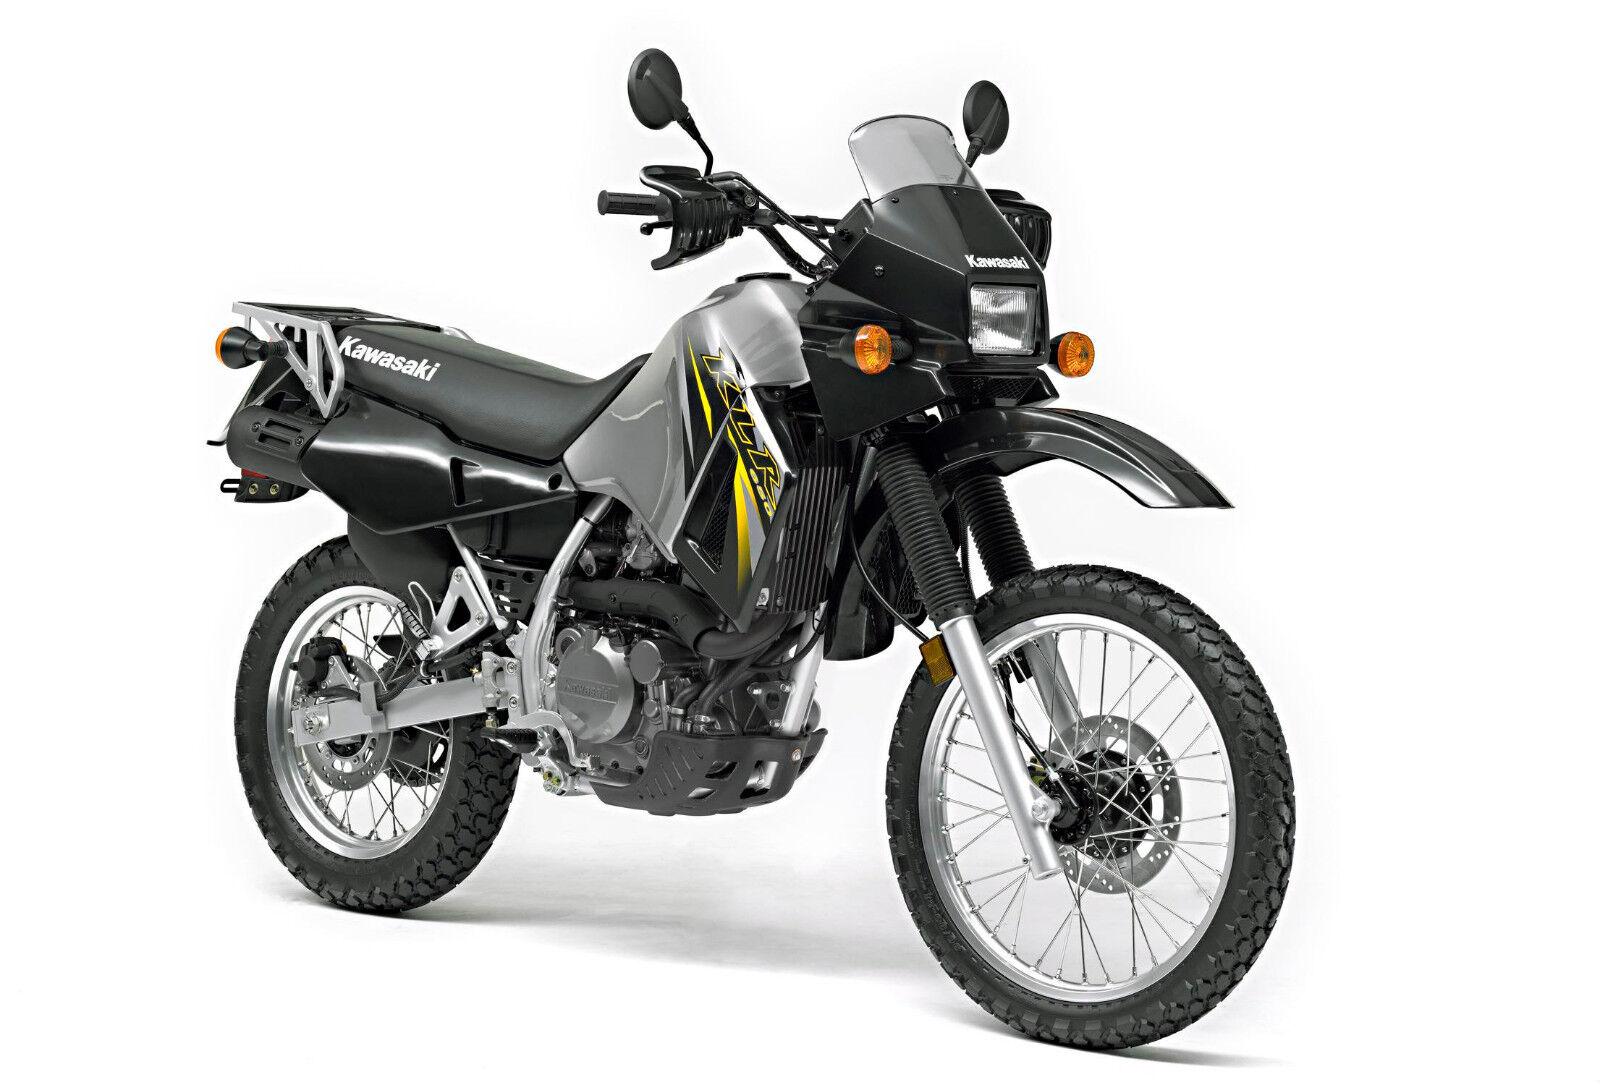 1003-0706 Vergaser Reparatur Satz Kawasaki KLR 650 1987-2007